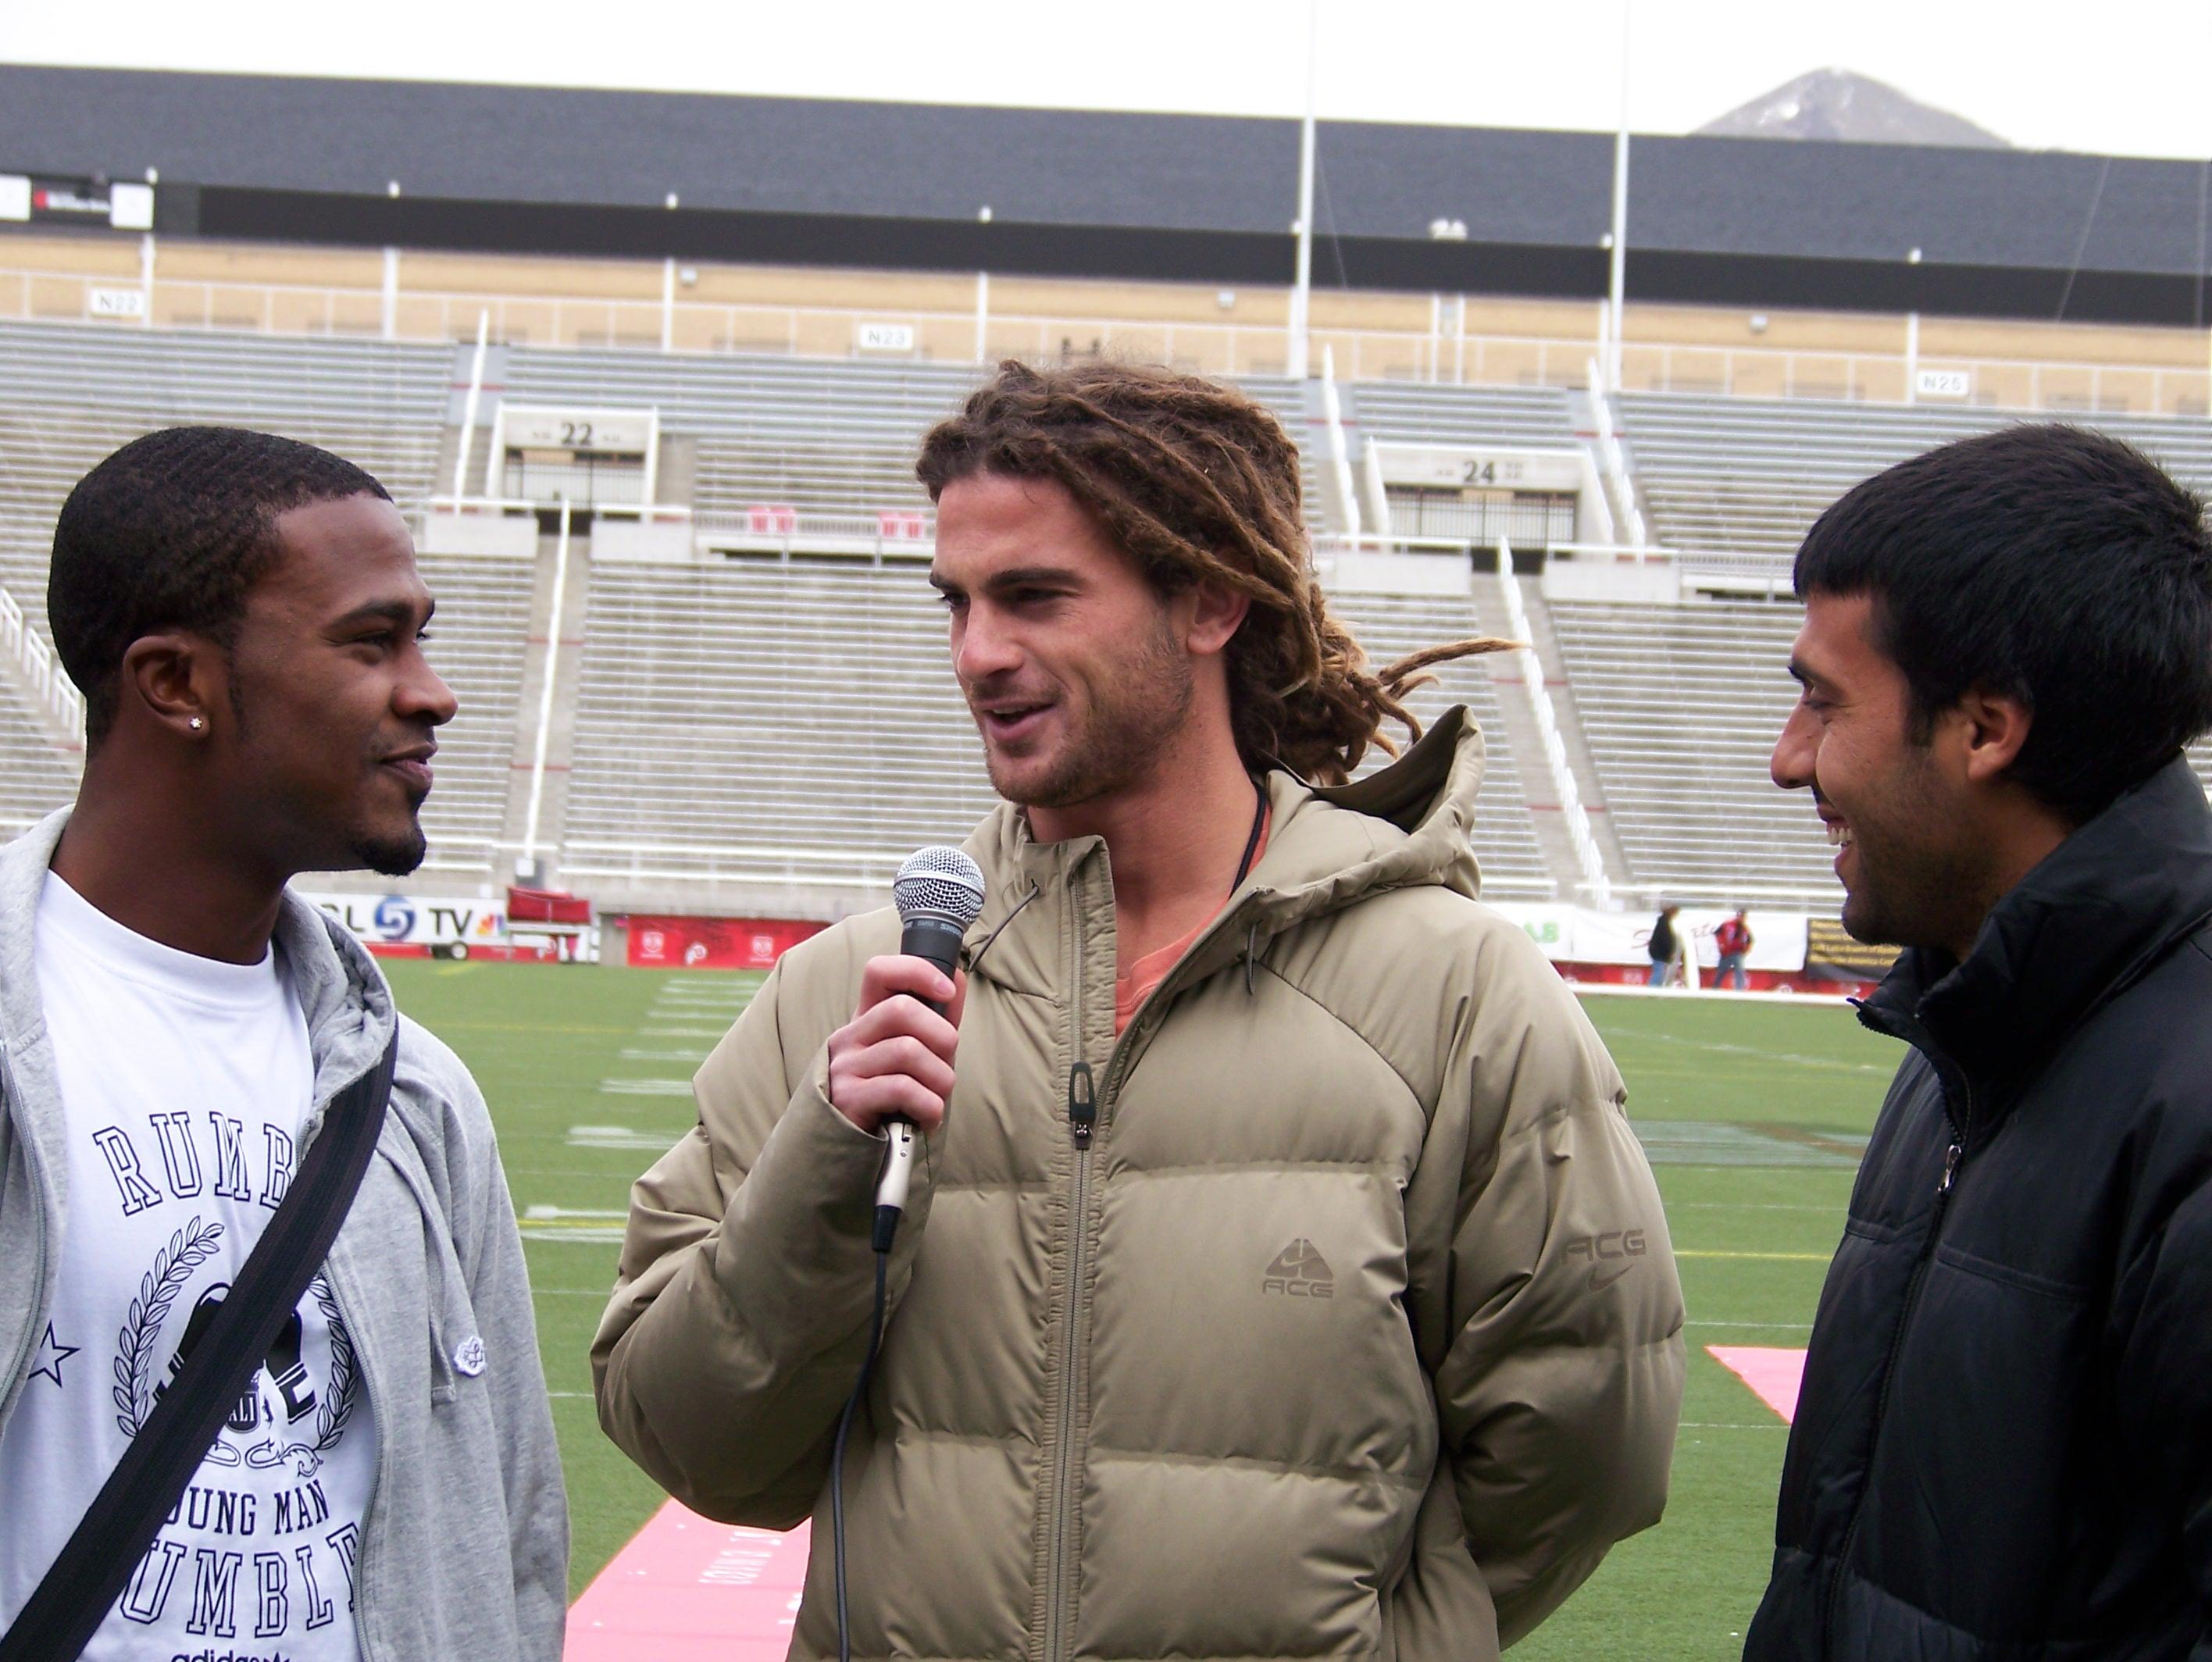 Aquí empezó todo...Pretemporada 2008 con Kyle & Javi...